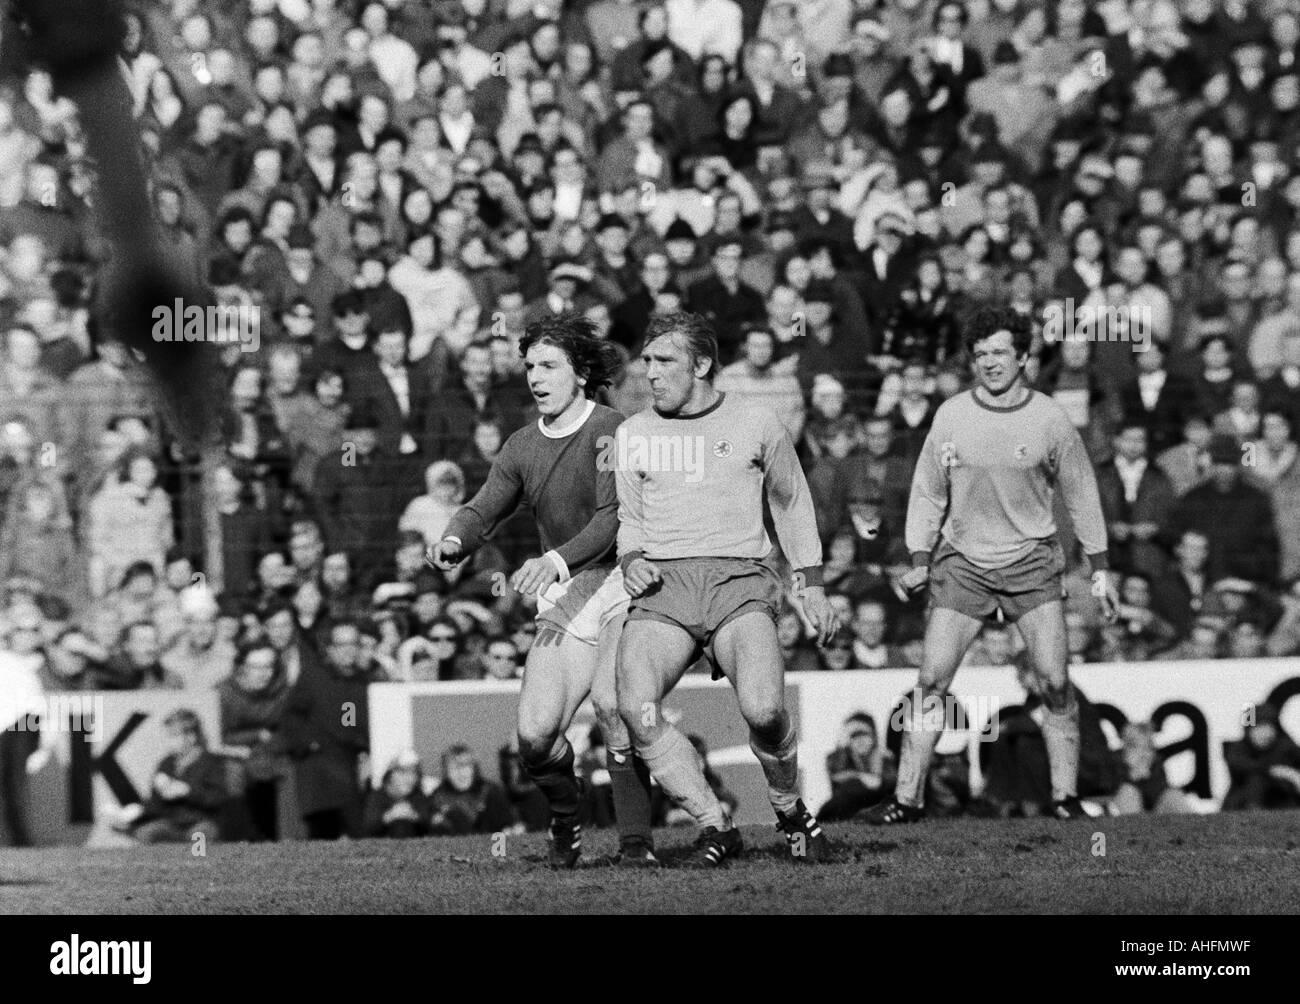 football, Bundesliga, 1971/1972, FC Schalke 04 versus Eintracht Brunswick 5:1, Glueckaufkampfbahn Stadium in Gelsenkirchen, scene of the match, f.l.t.r. Klaus Fischer (S04), Peter Kaack (BS), Friedhelm Haebermann (BS) - Stock Image